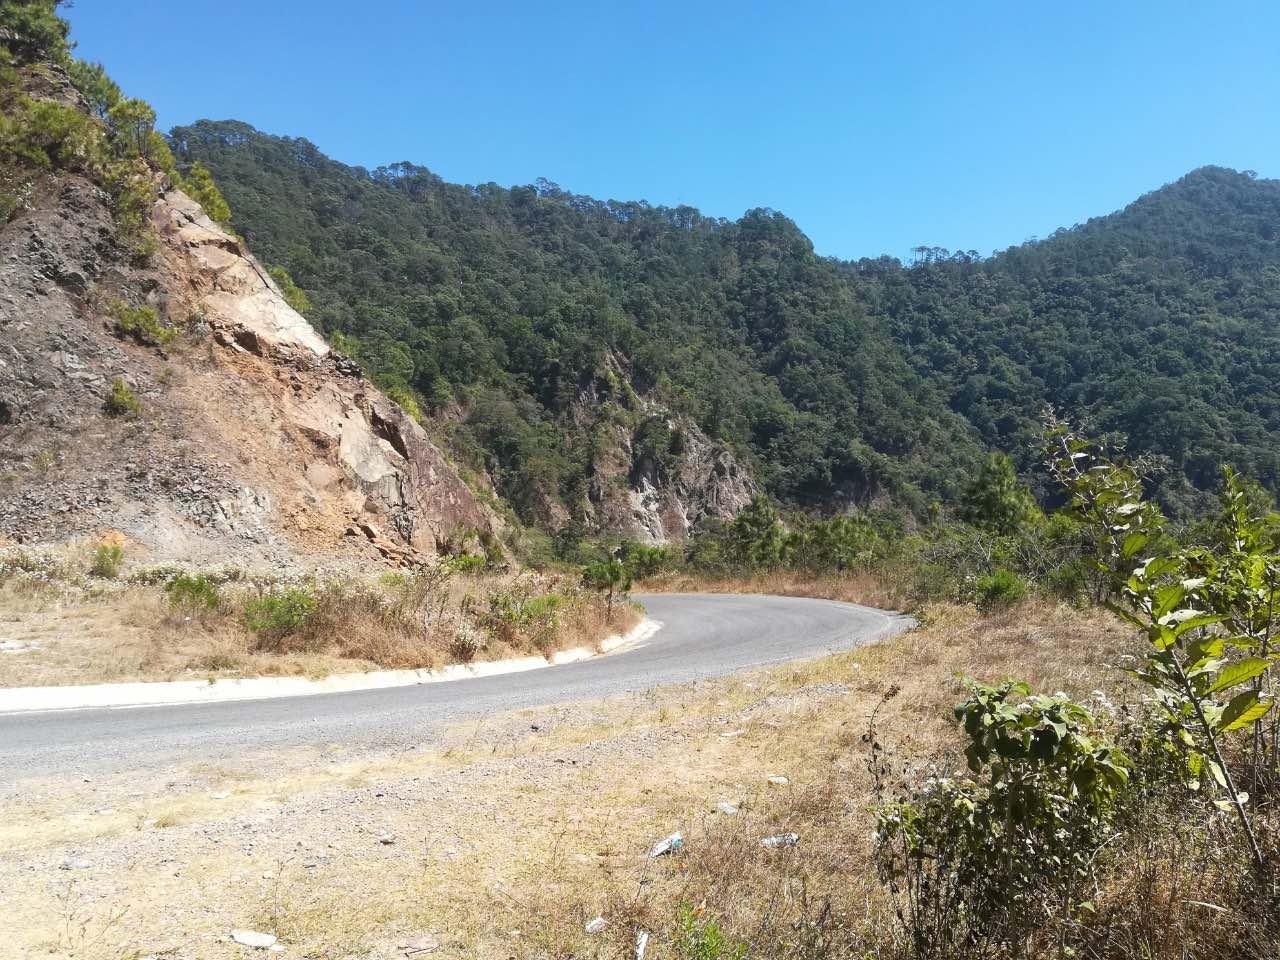 Carretera en Talpa-Jalisco